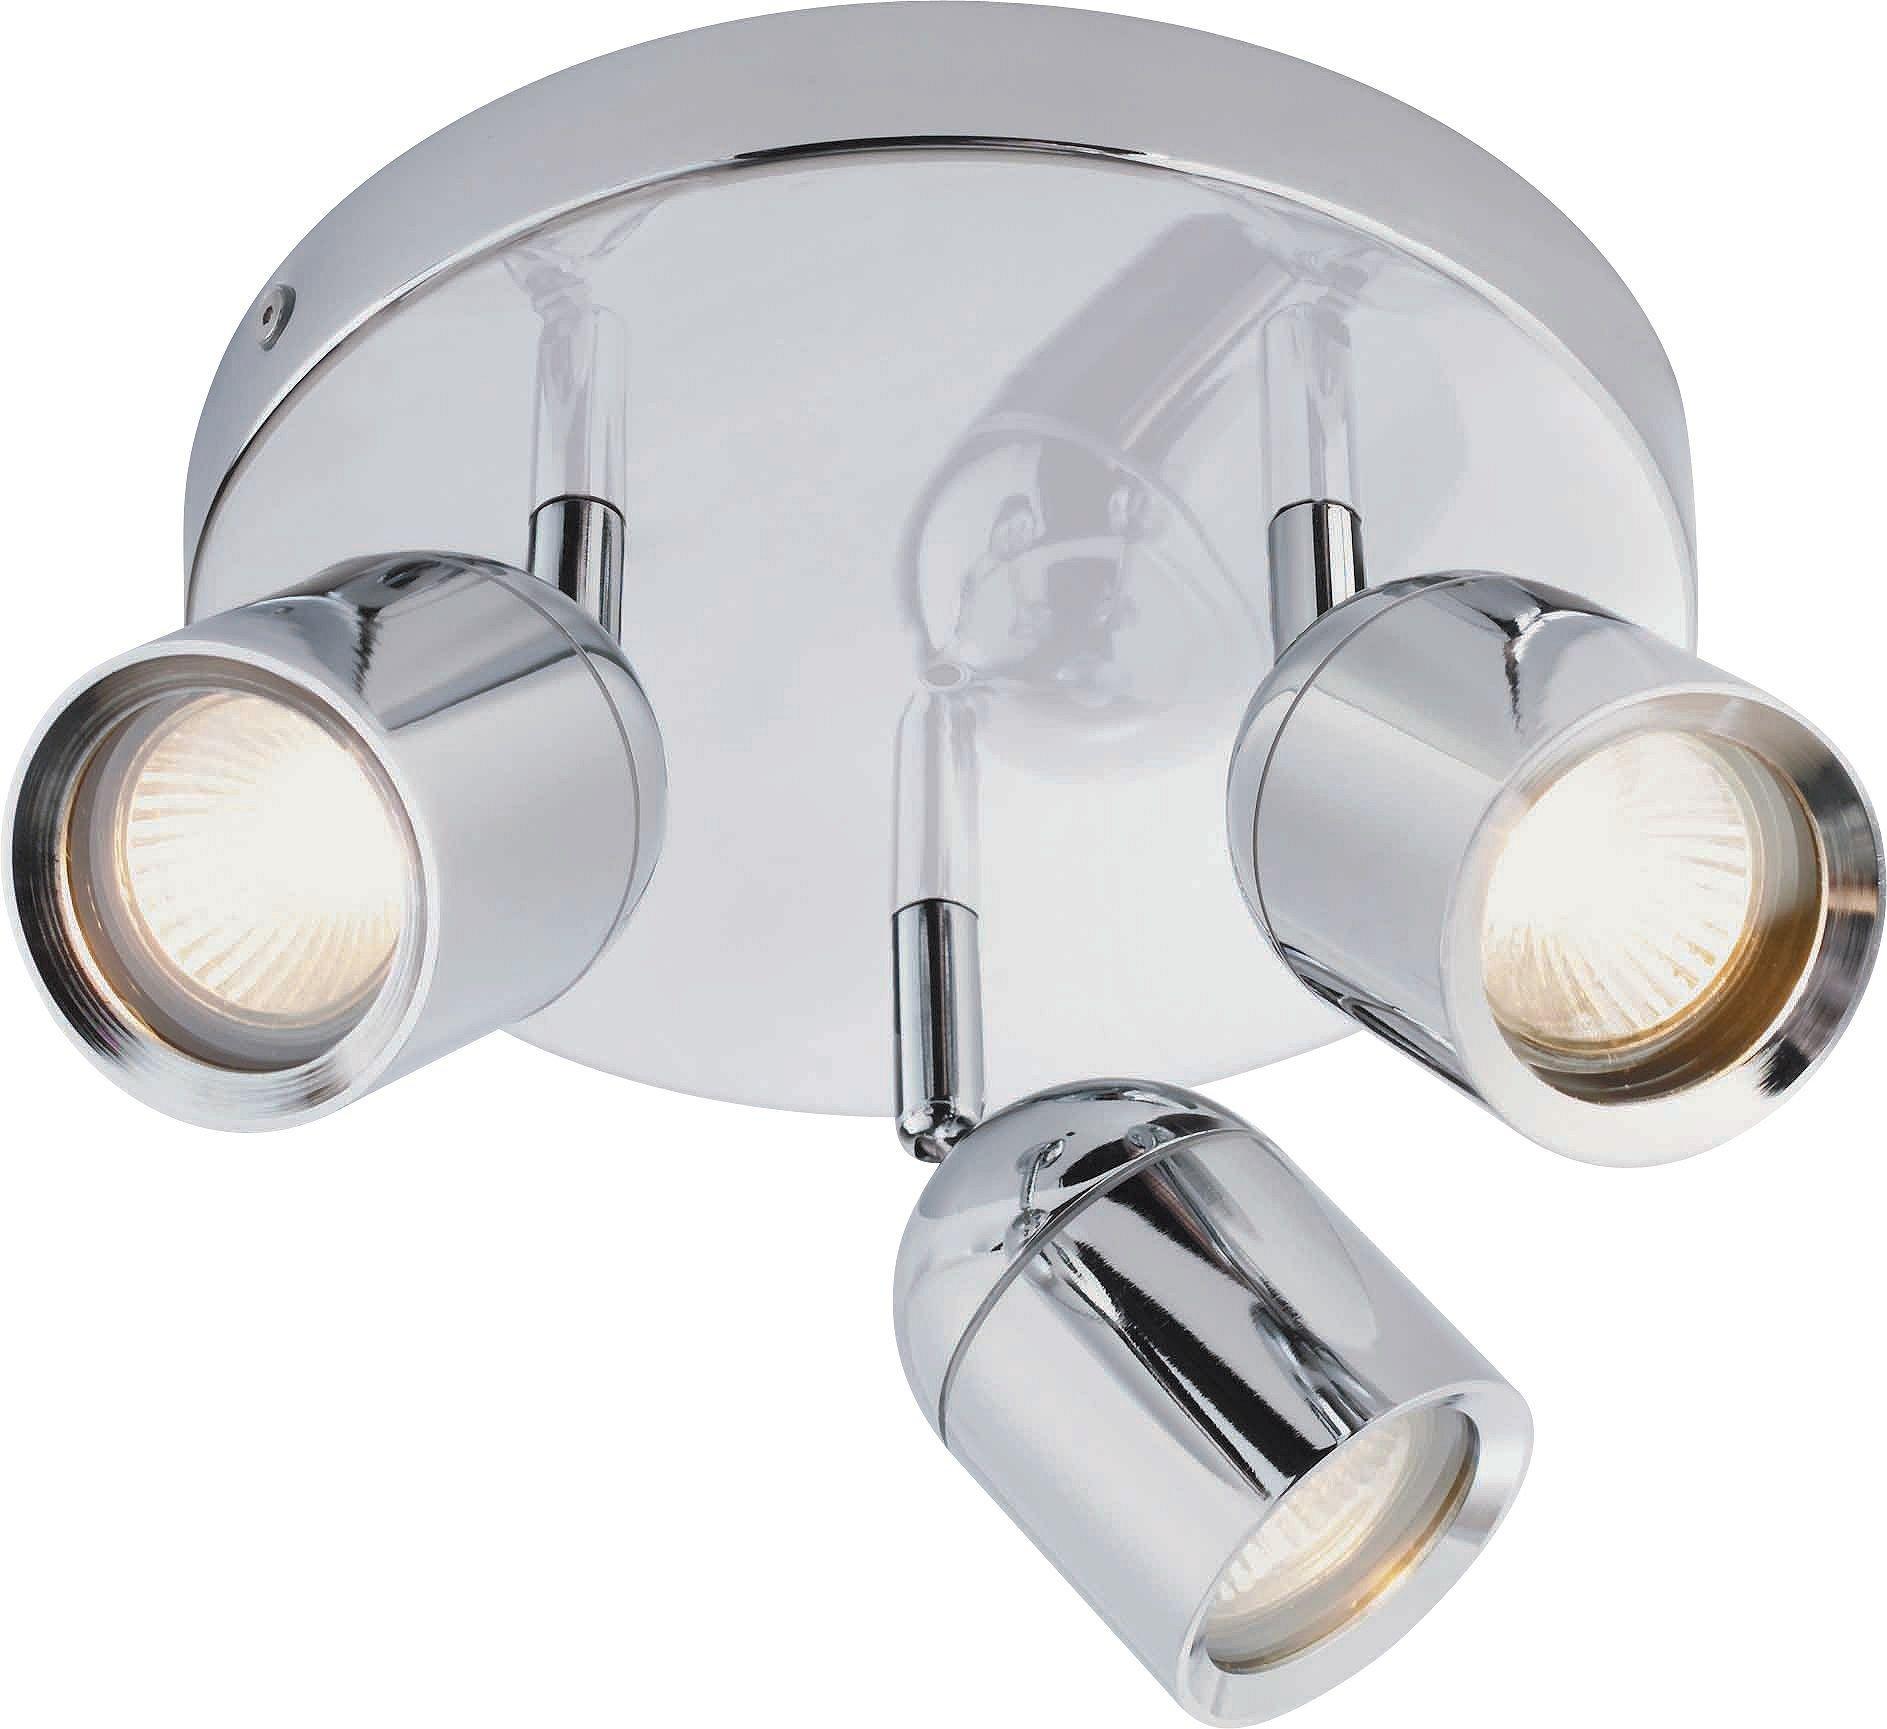 Bathroom Light Fixtures Argos buy collection baretta 3 light bathroom spotlight - chrome at